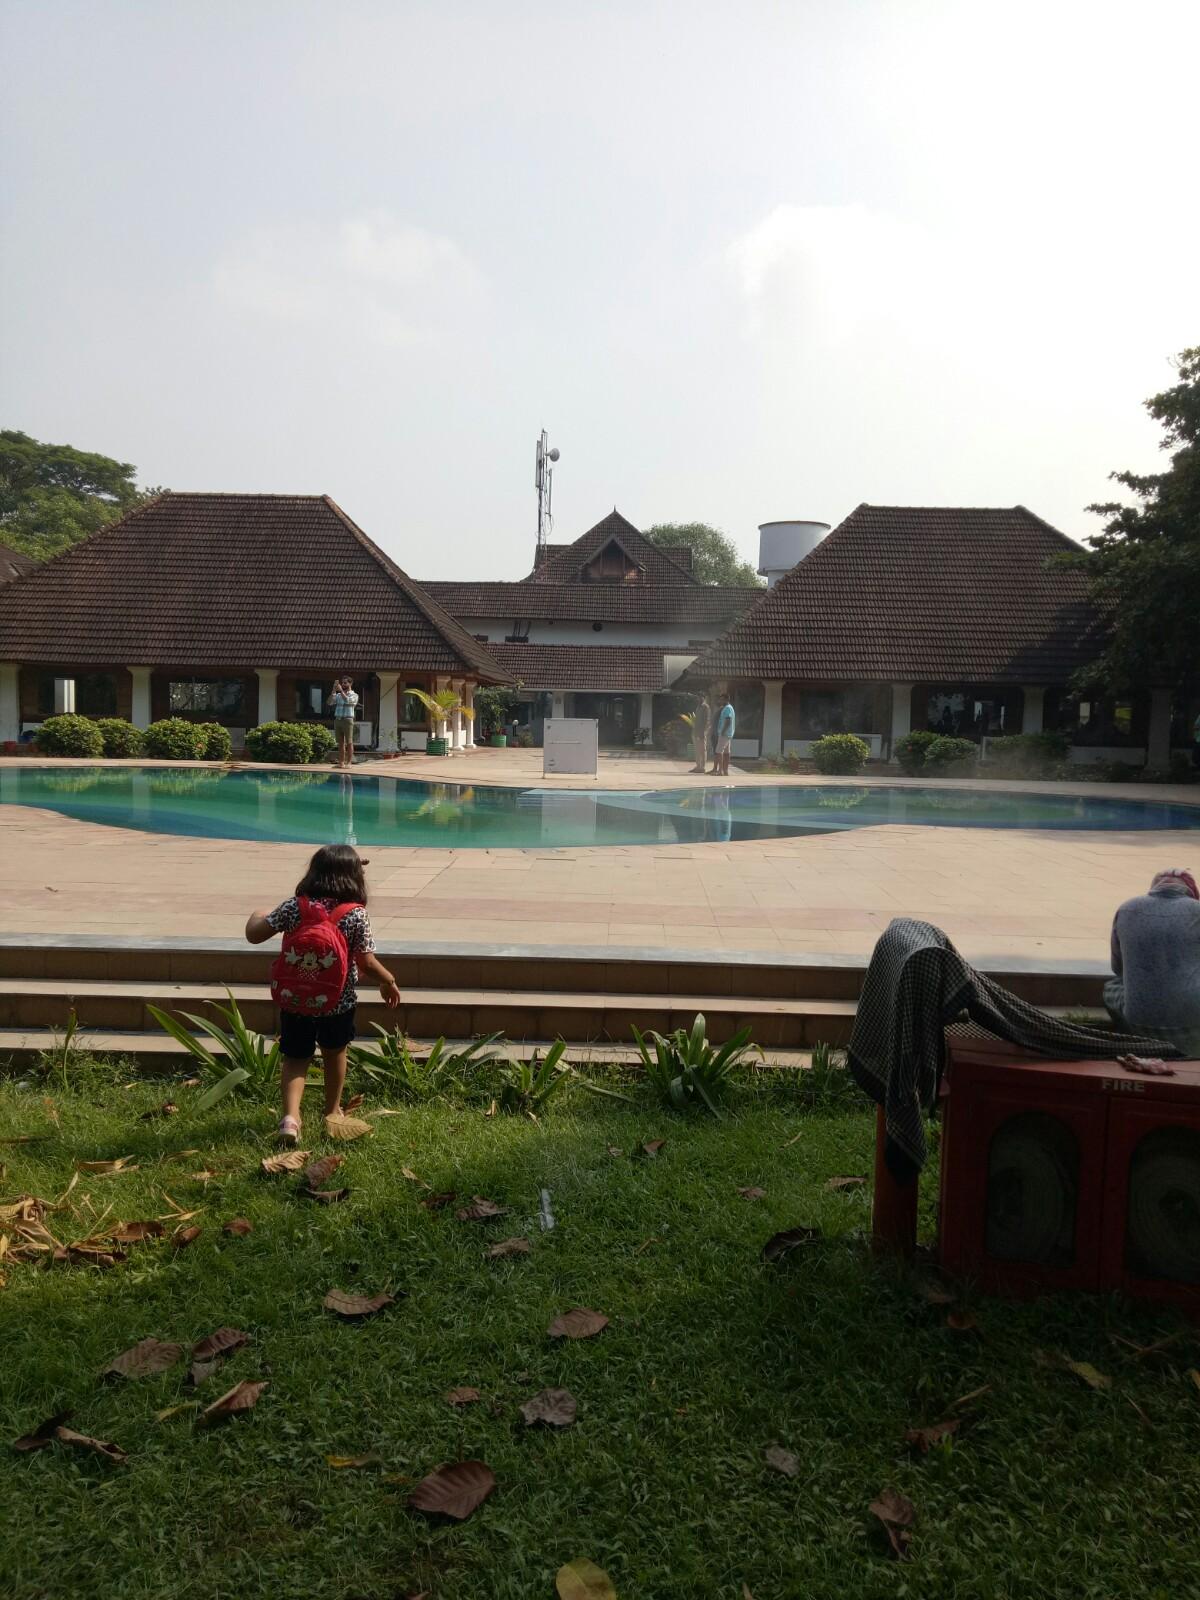 Bolghatty Palace Hotel